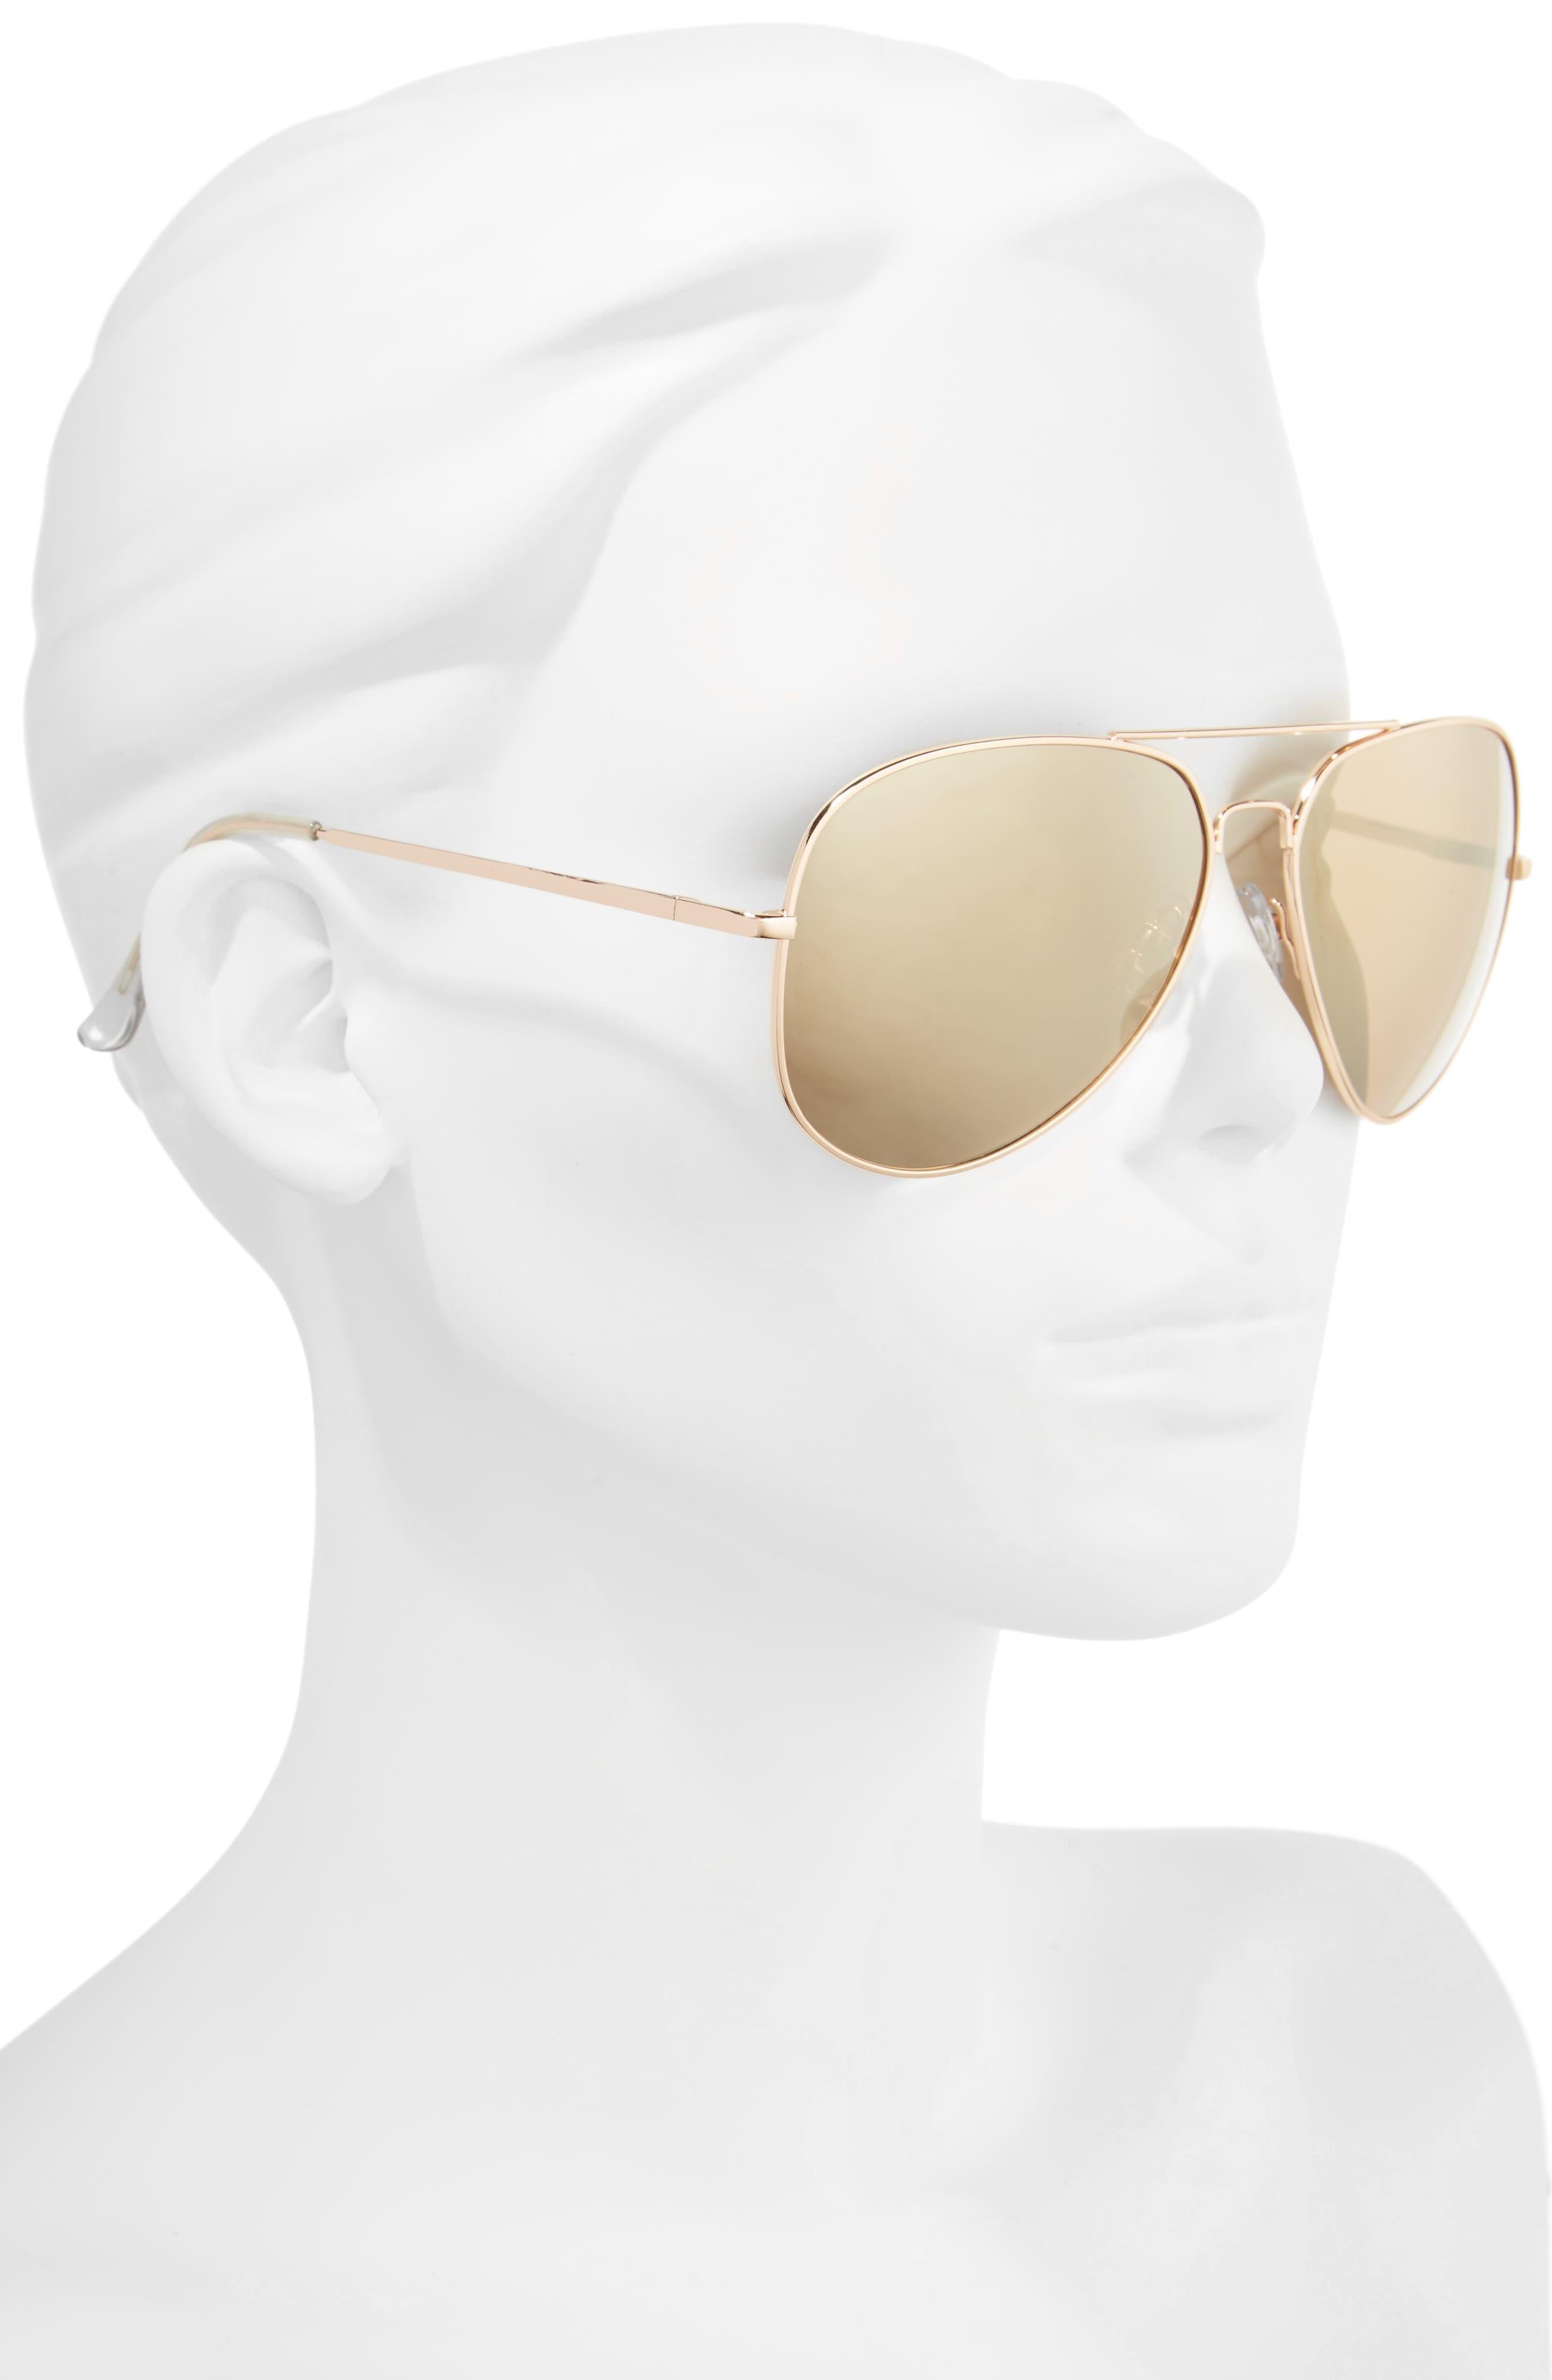 60mm Large Aviator Sunglasses,                             Alternate thumbnail 4, color,